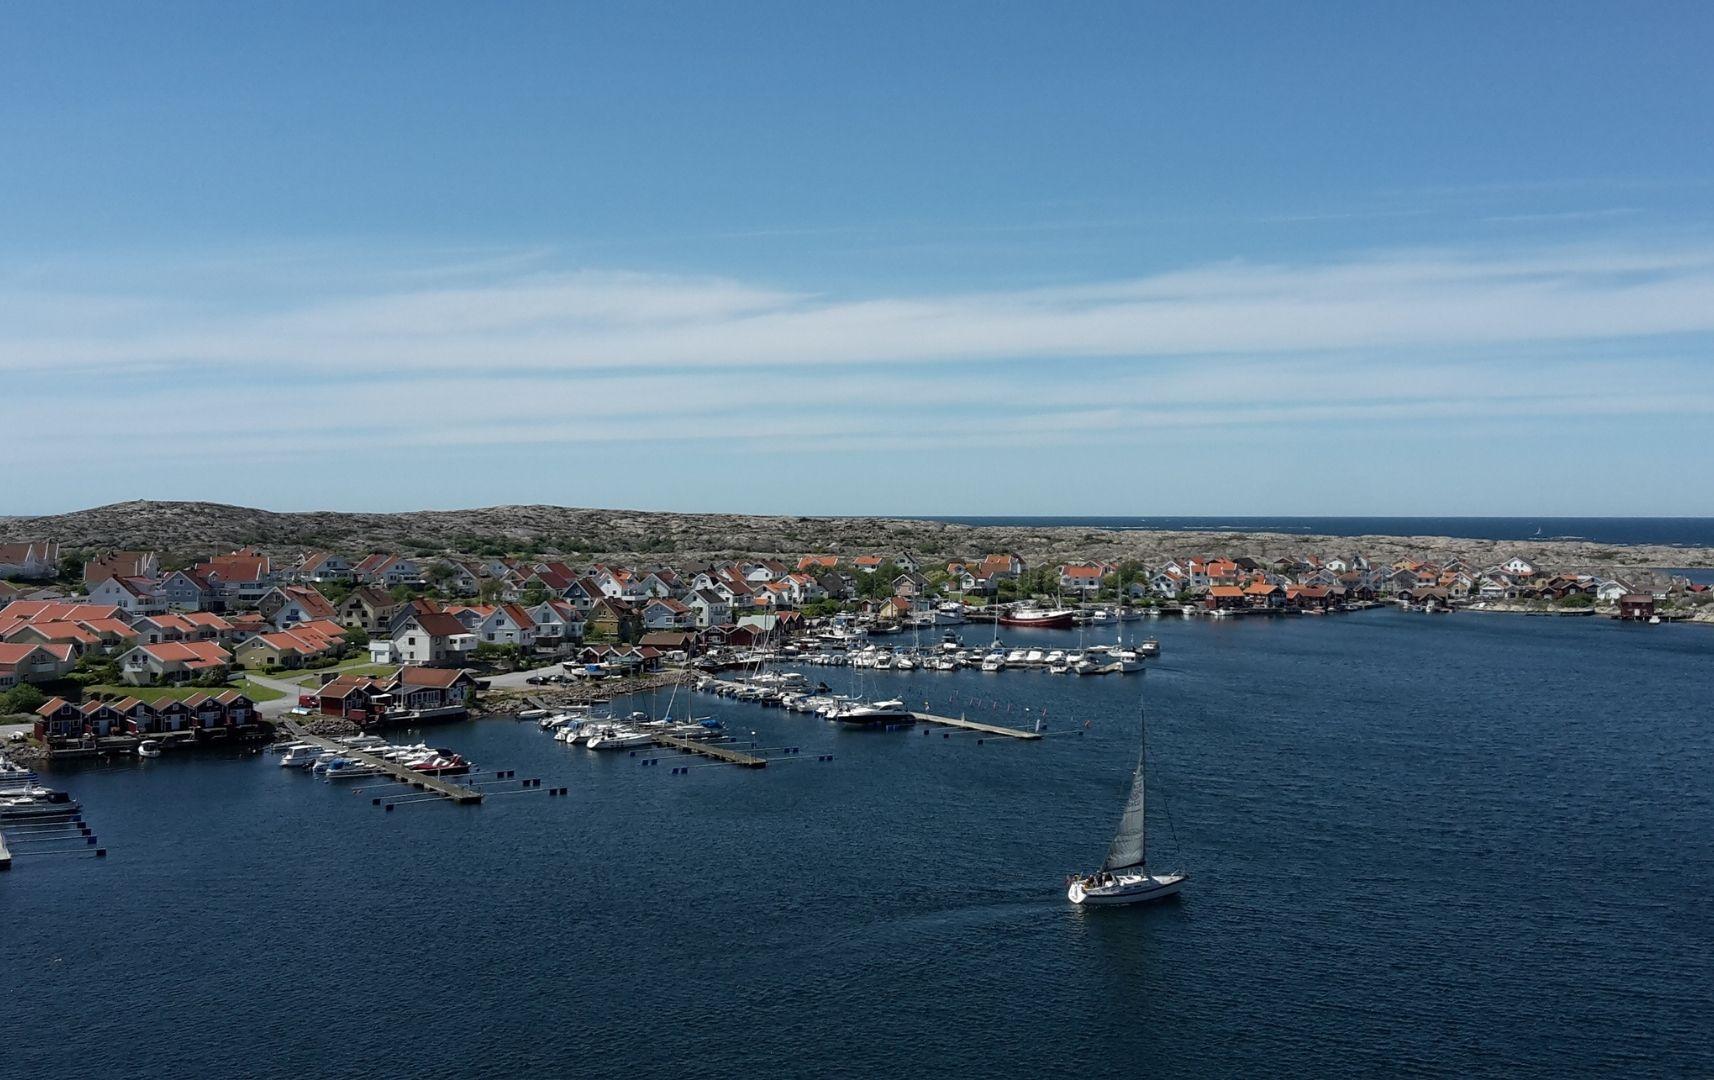 Schweden Reisebericht Reiseart